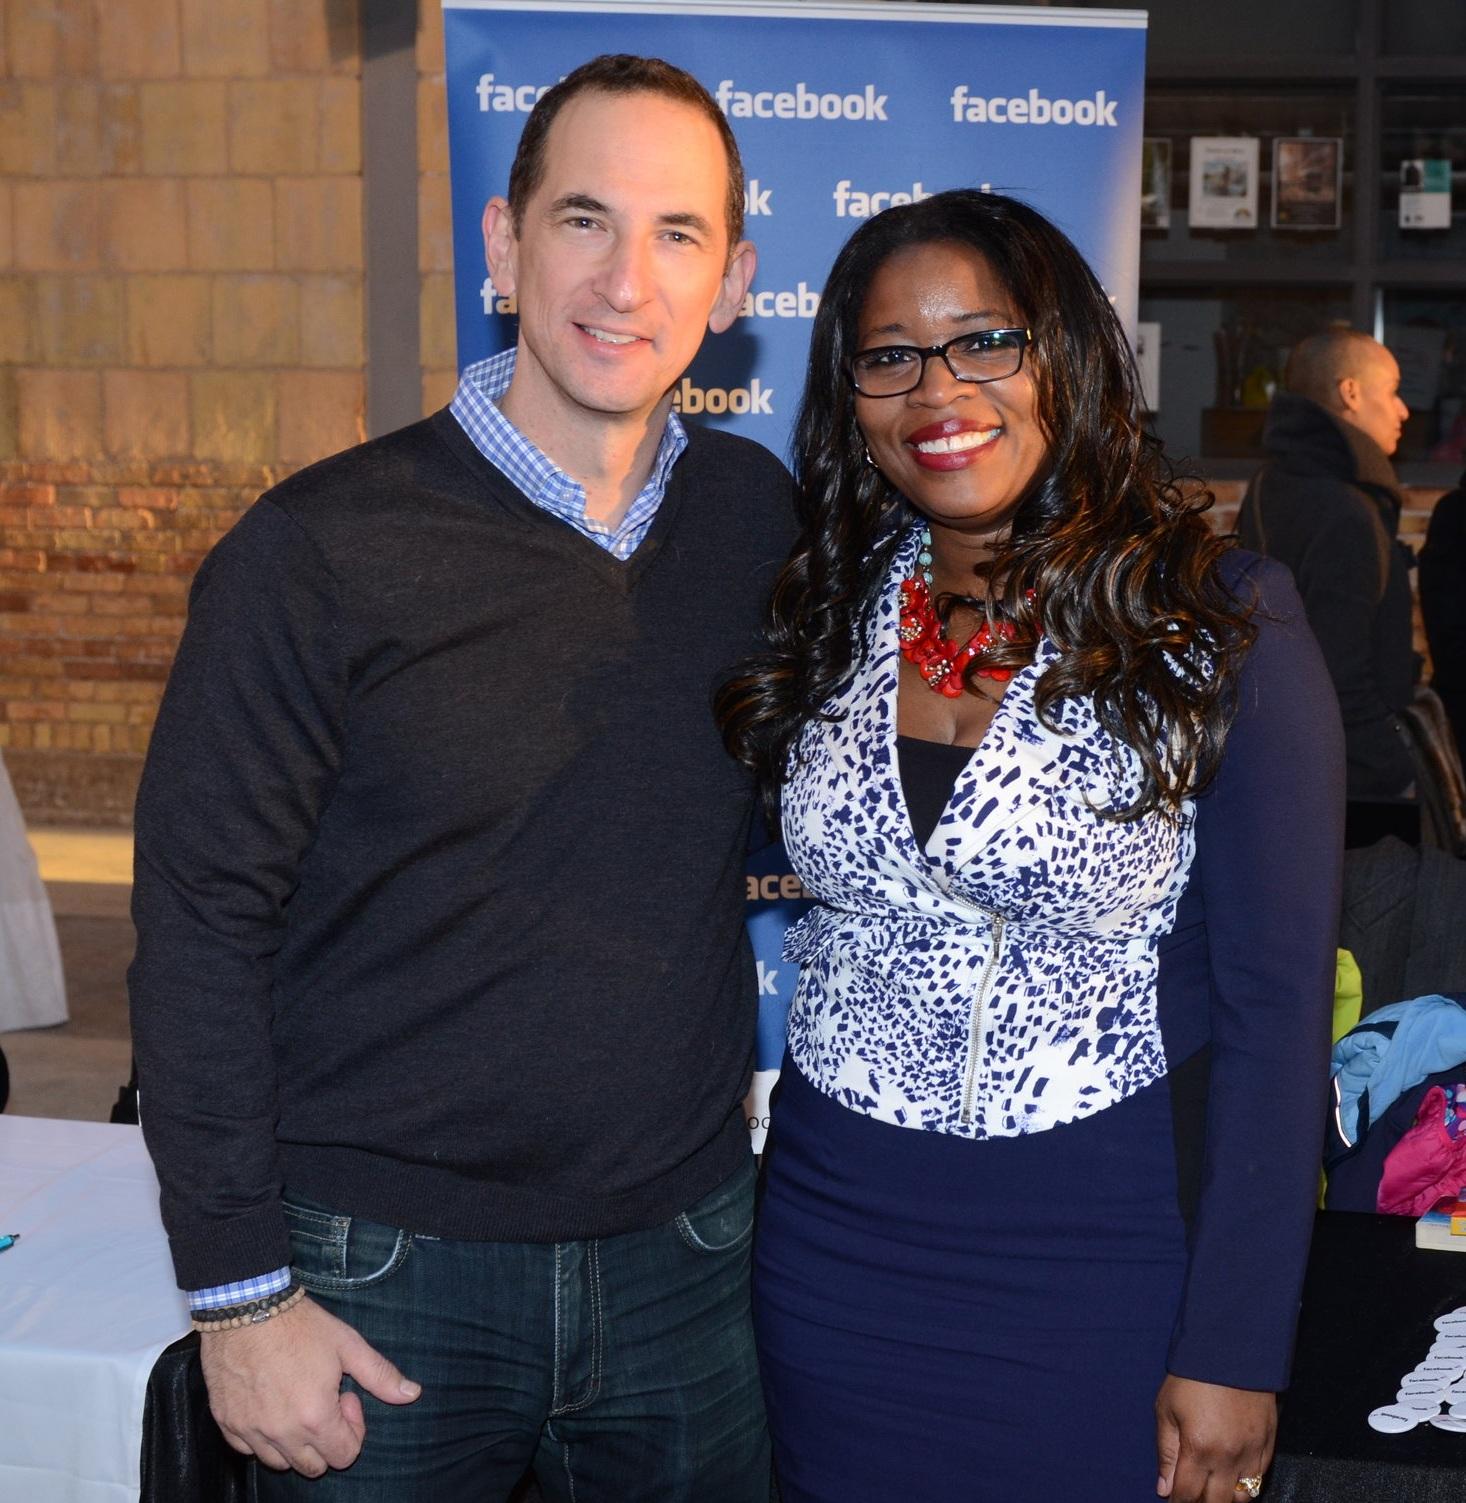 Claudette McGowan with Facebook Canada managing director & global head of vertical strategy Jordan Banks